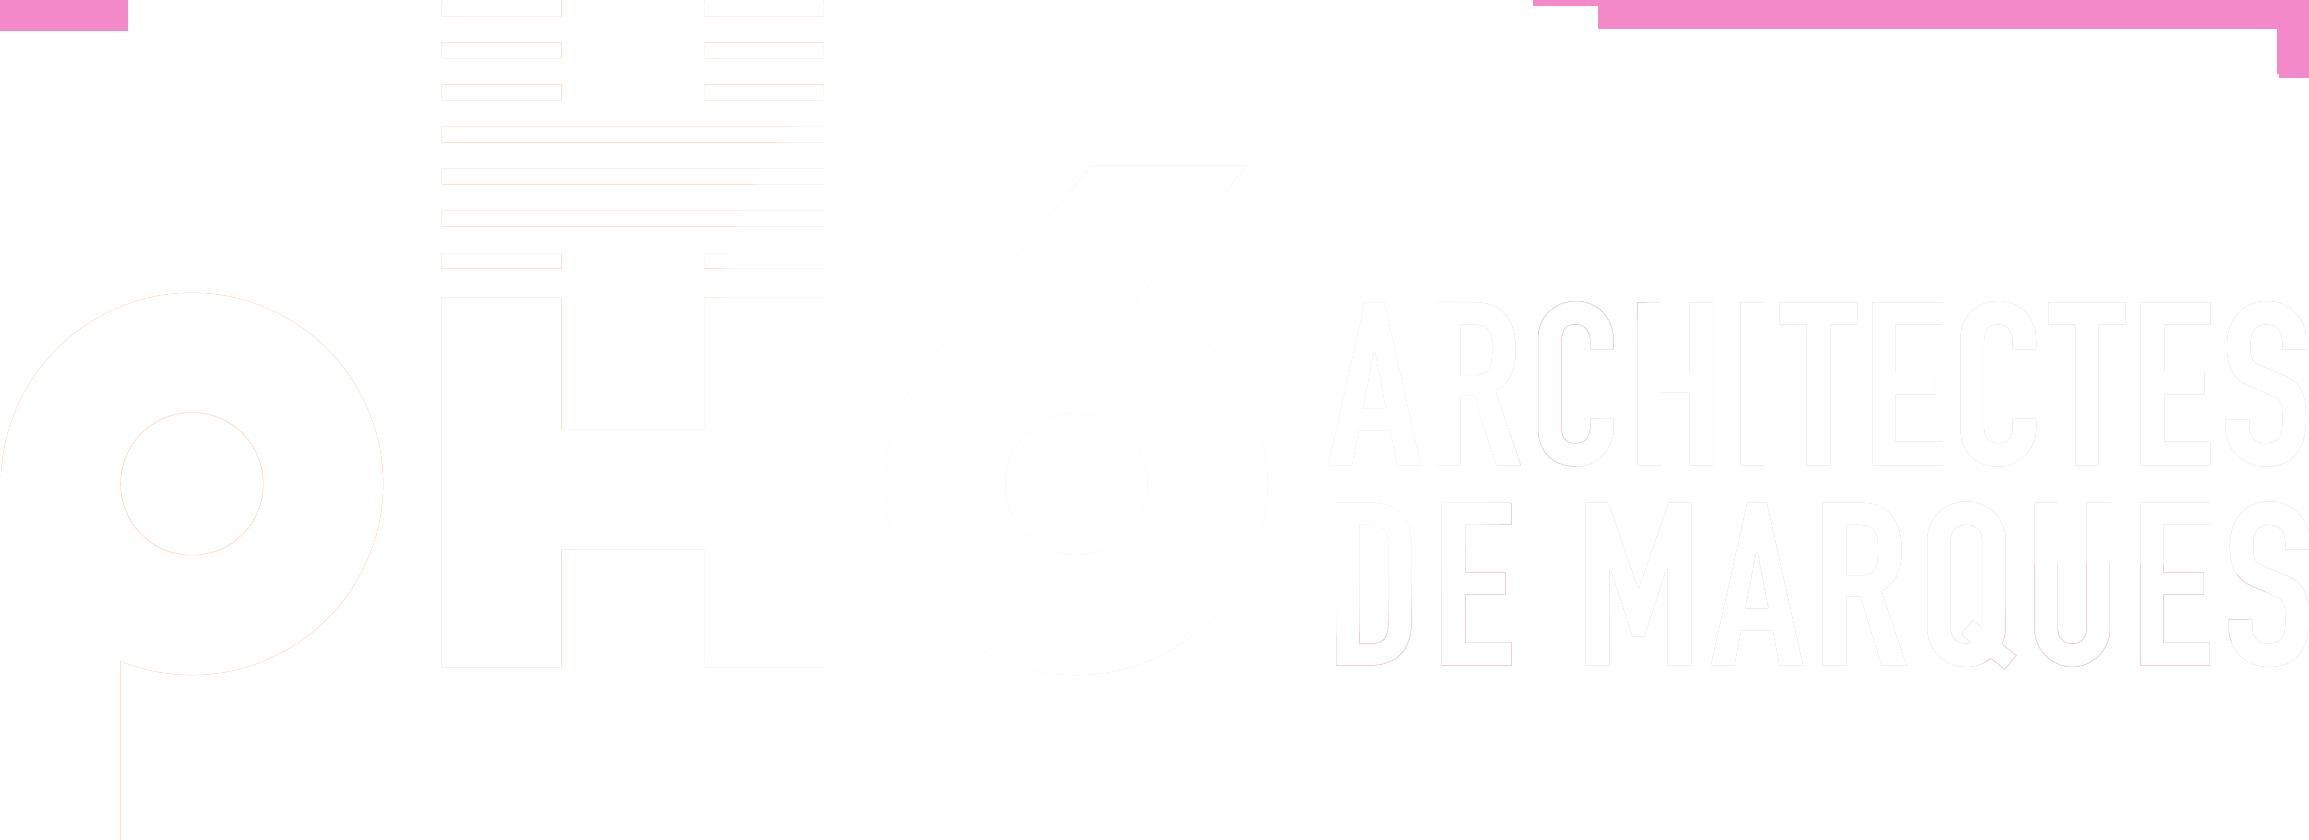 pH6 - Architectes de Marques